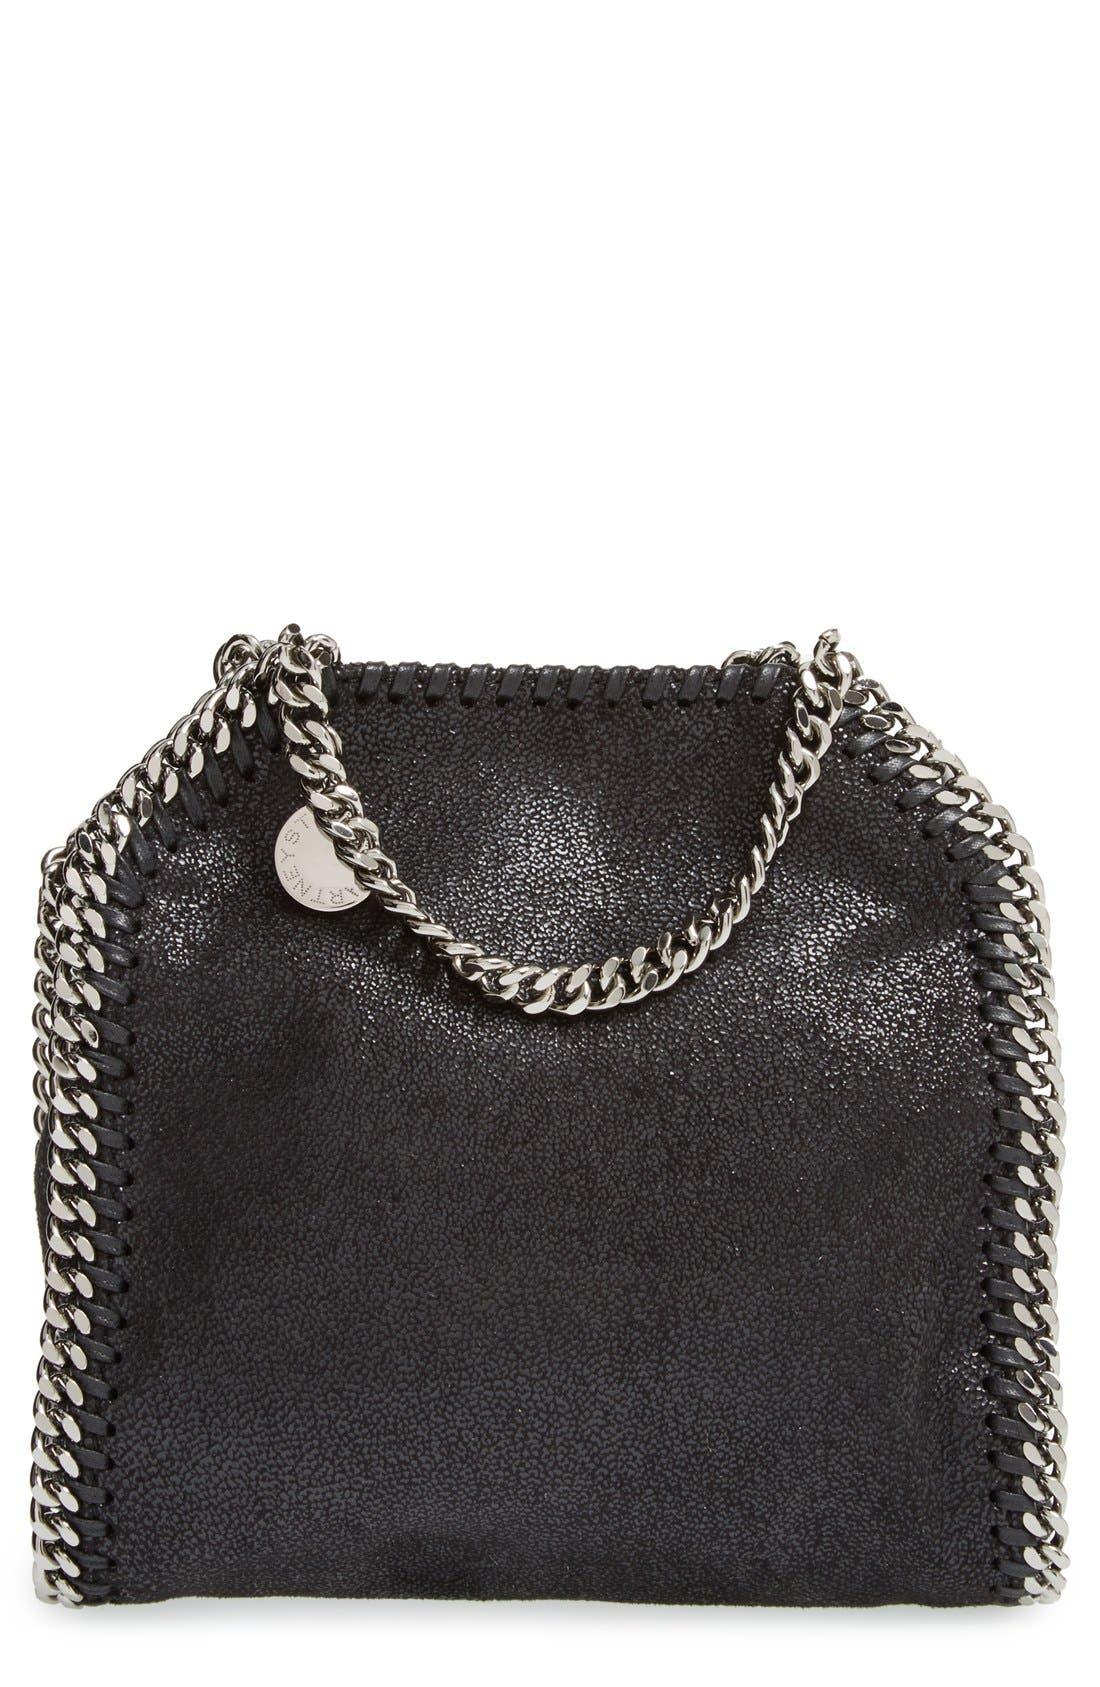 'Tiny Falabella' Faux Leather Crossbody Bag,                             Main thumbnail 1, color,                             Black